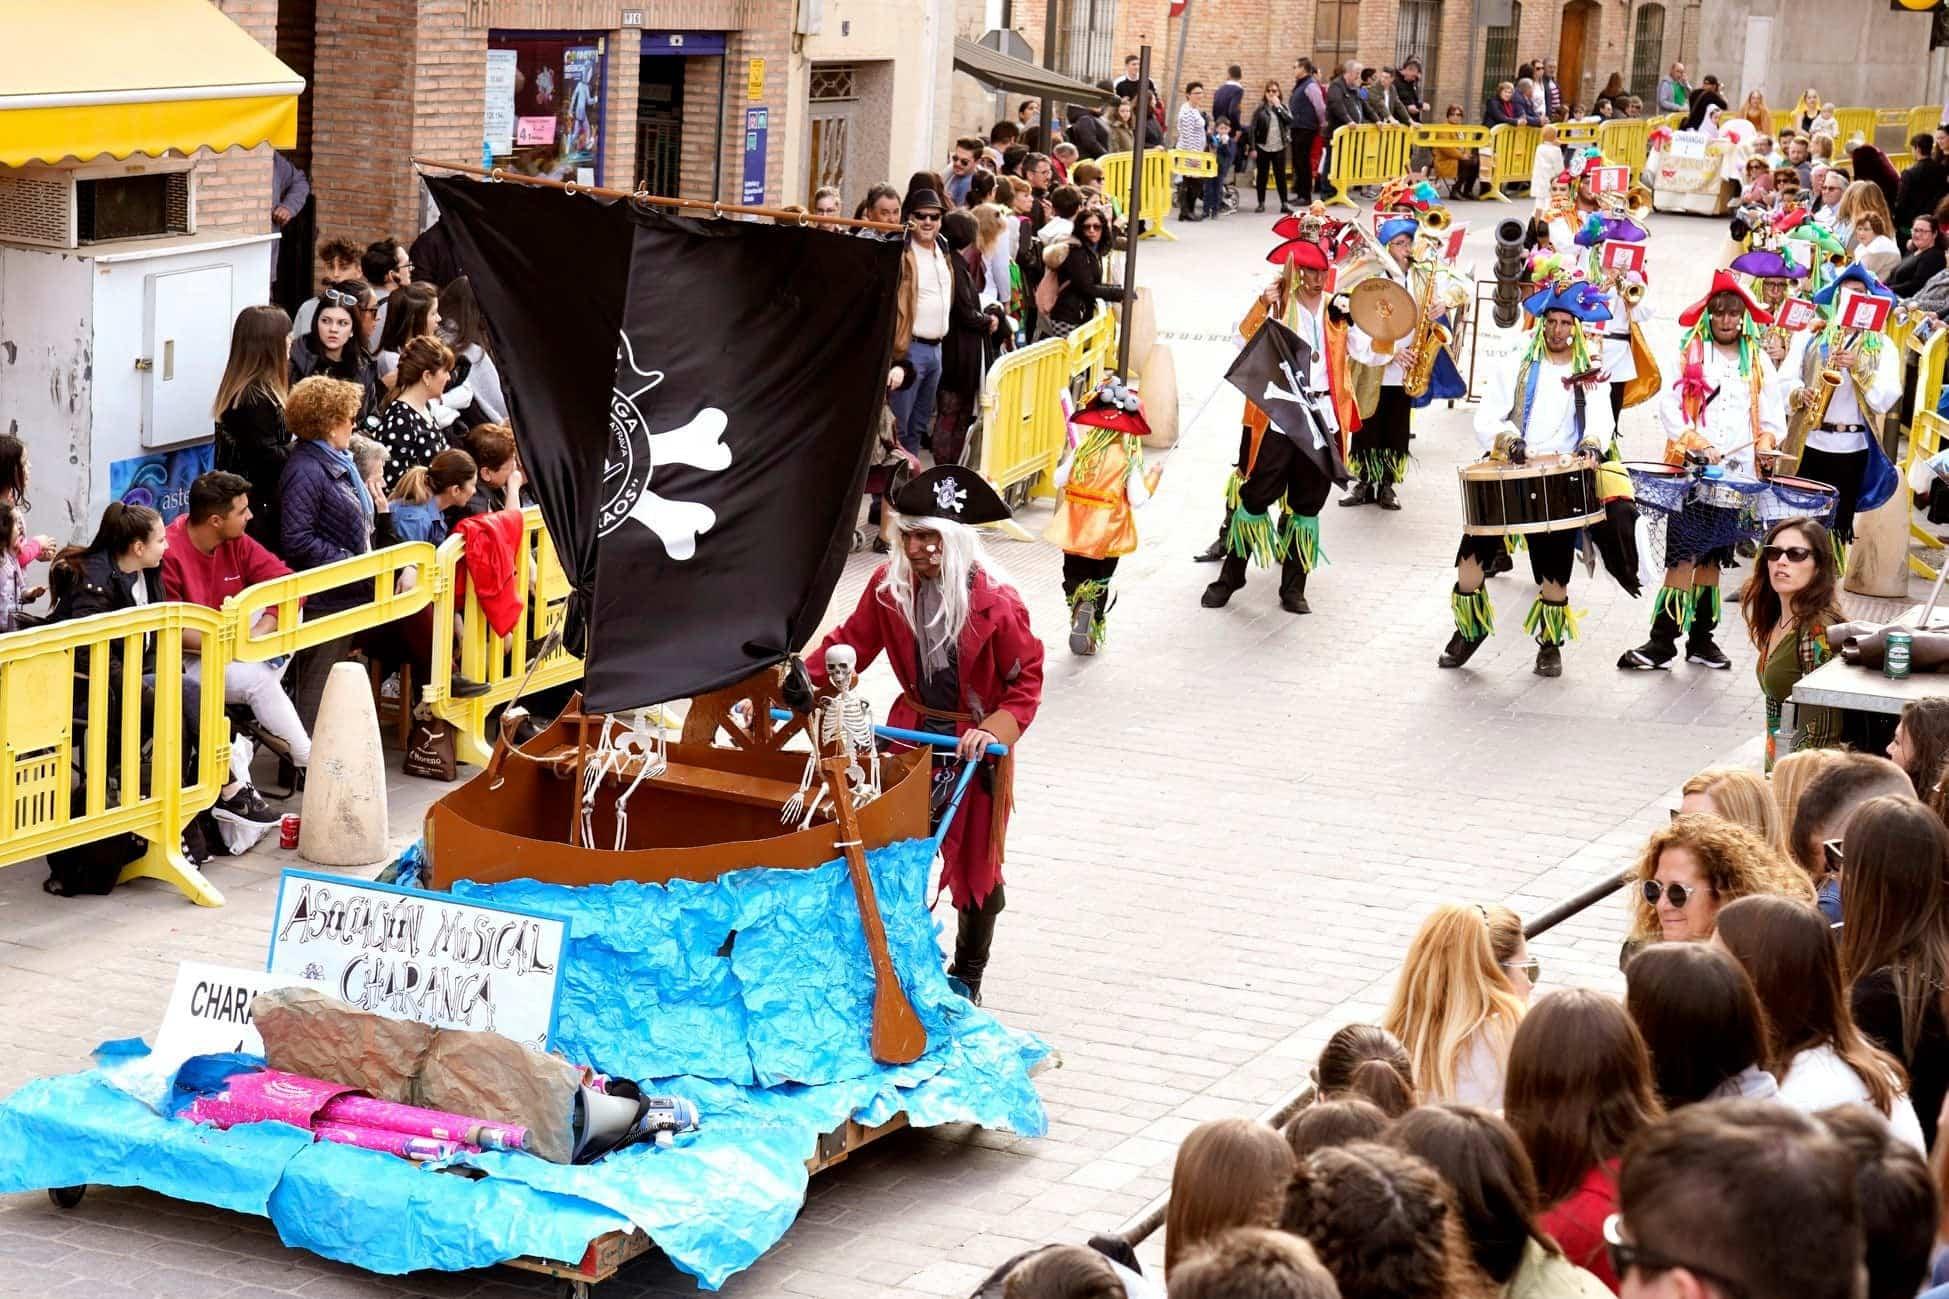 Carnaval de herencia 2020 ofertorio 121 - Selección de fotografías del Ofertorio del Carnaval de Herencia